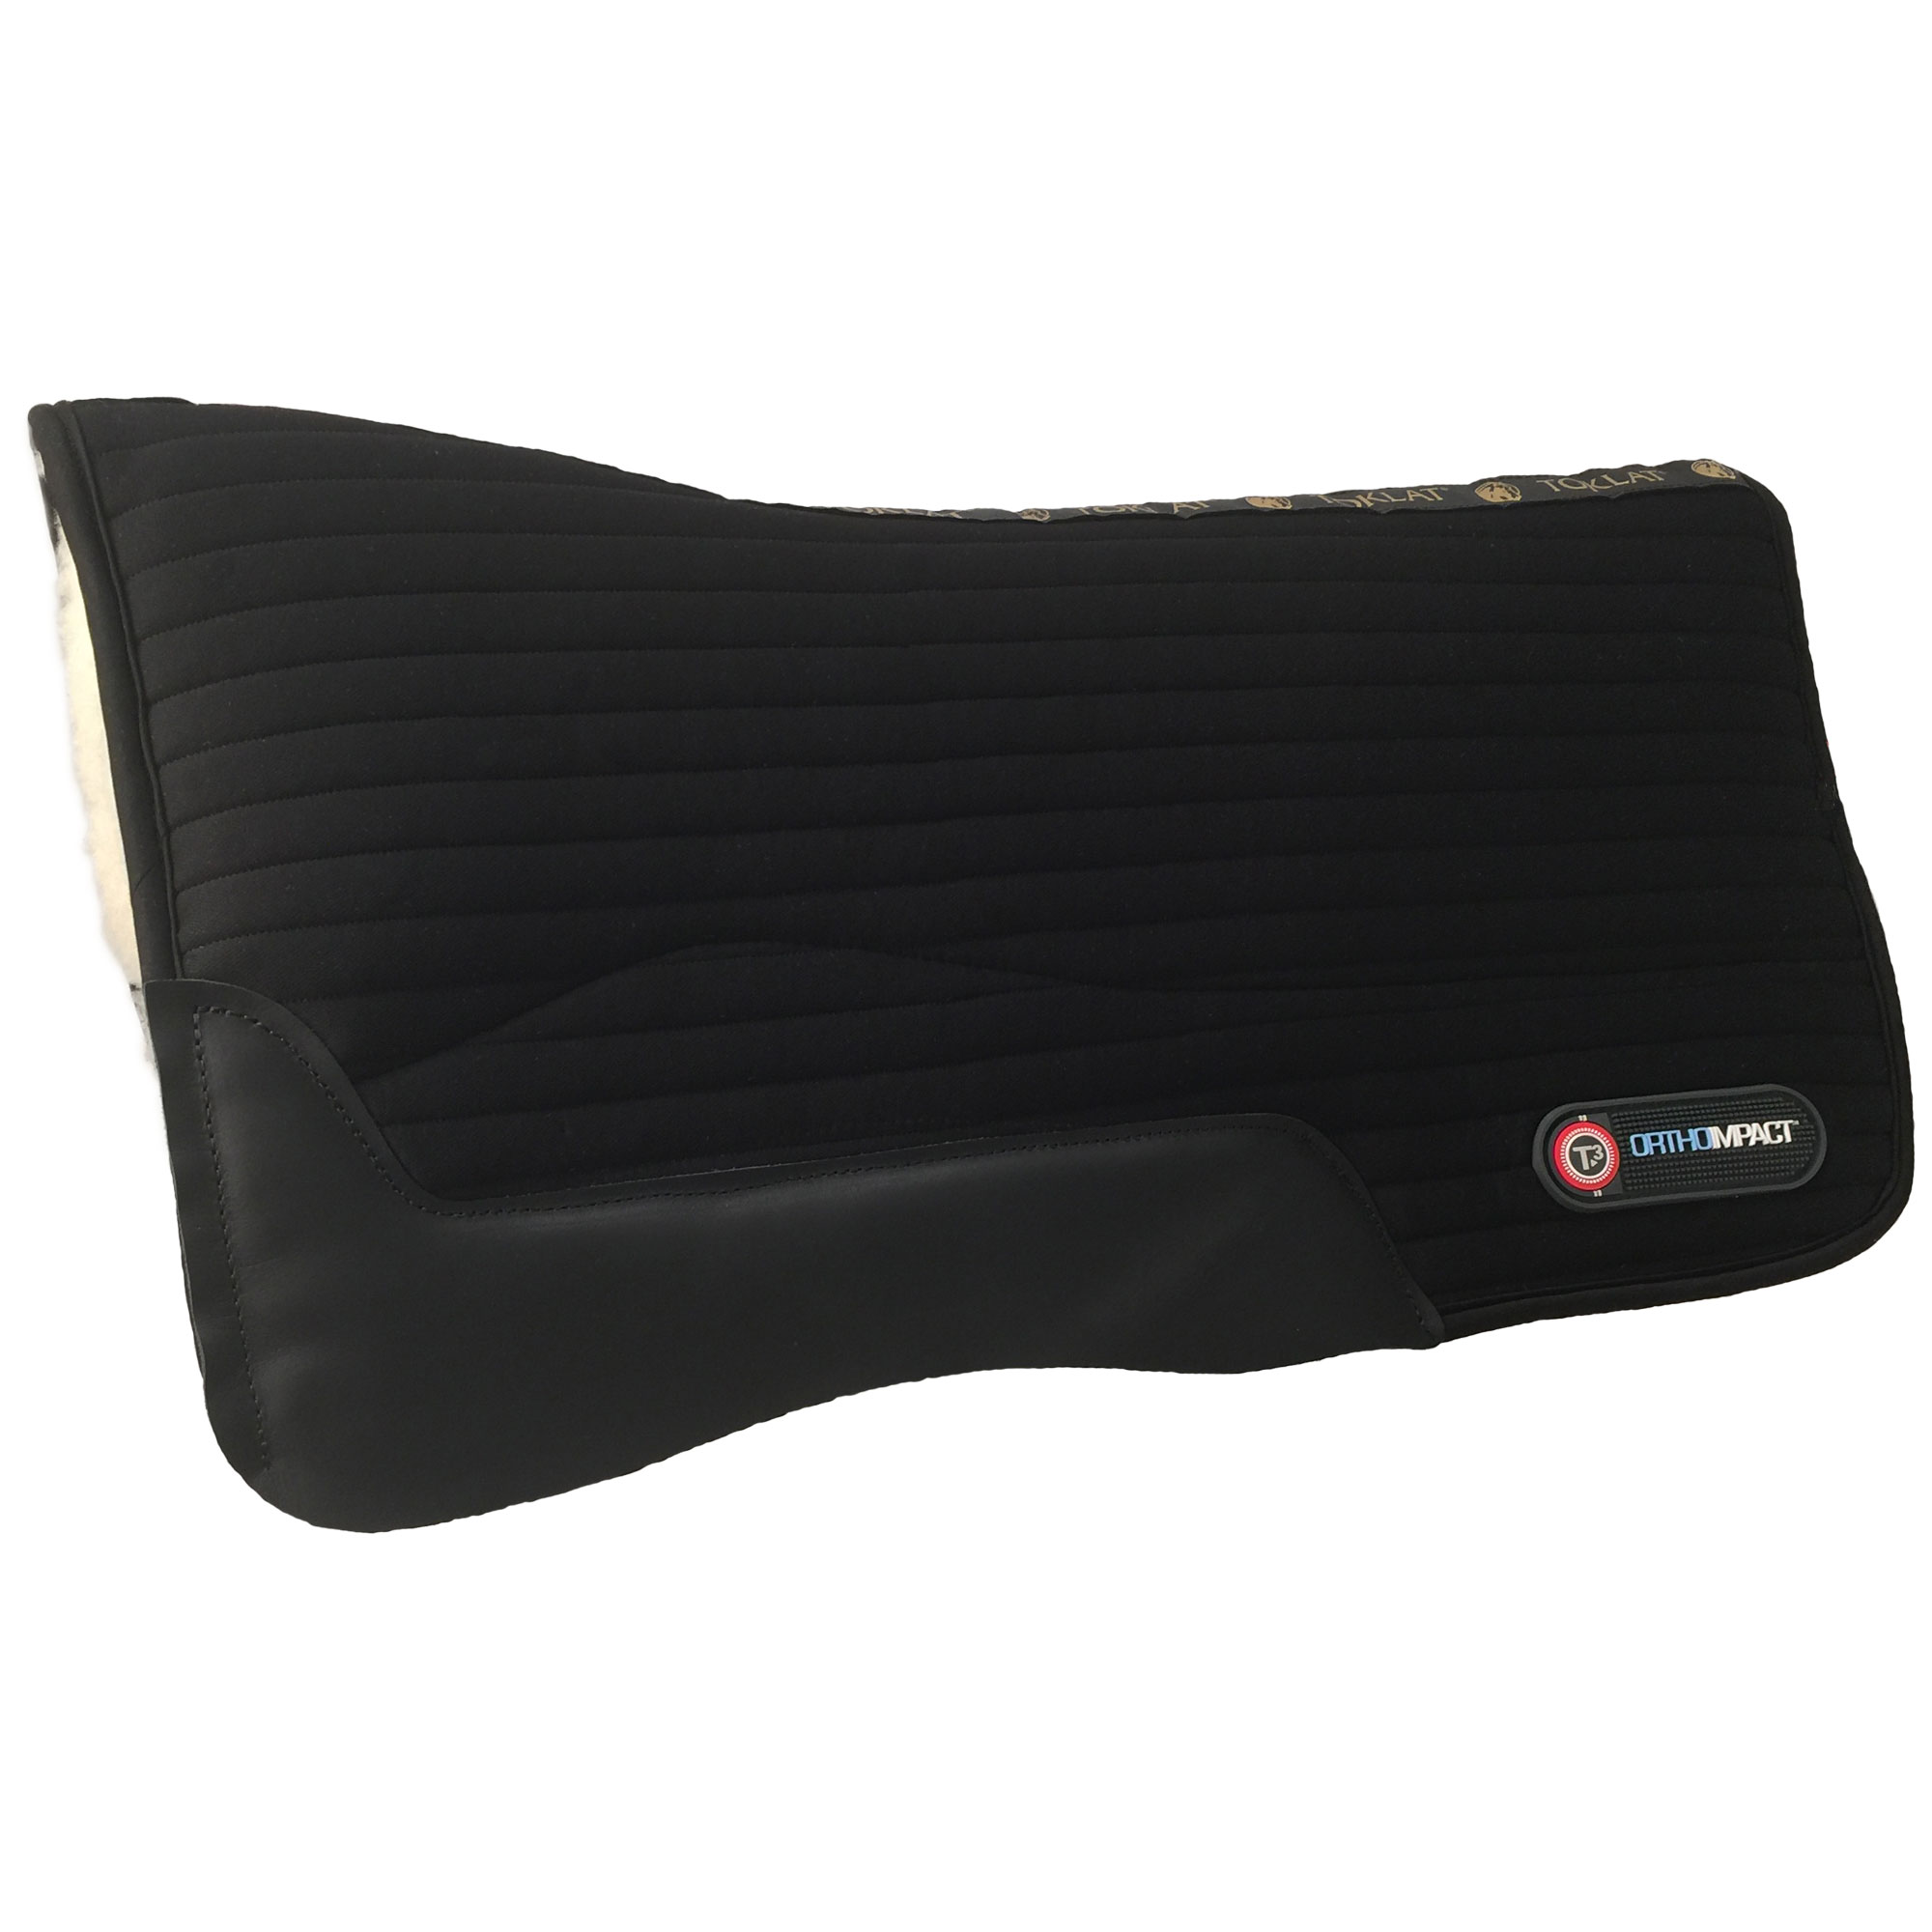 Toklat T3 Matrix Shim WoolBack Western Saddle Pad with Impact Inserts